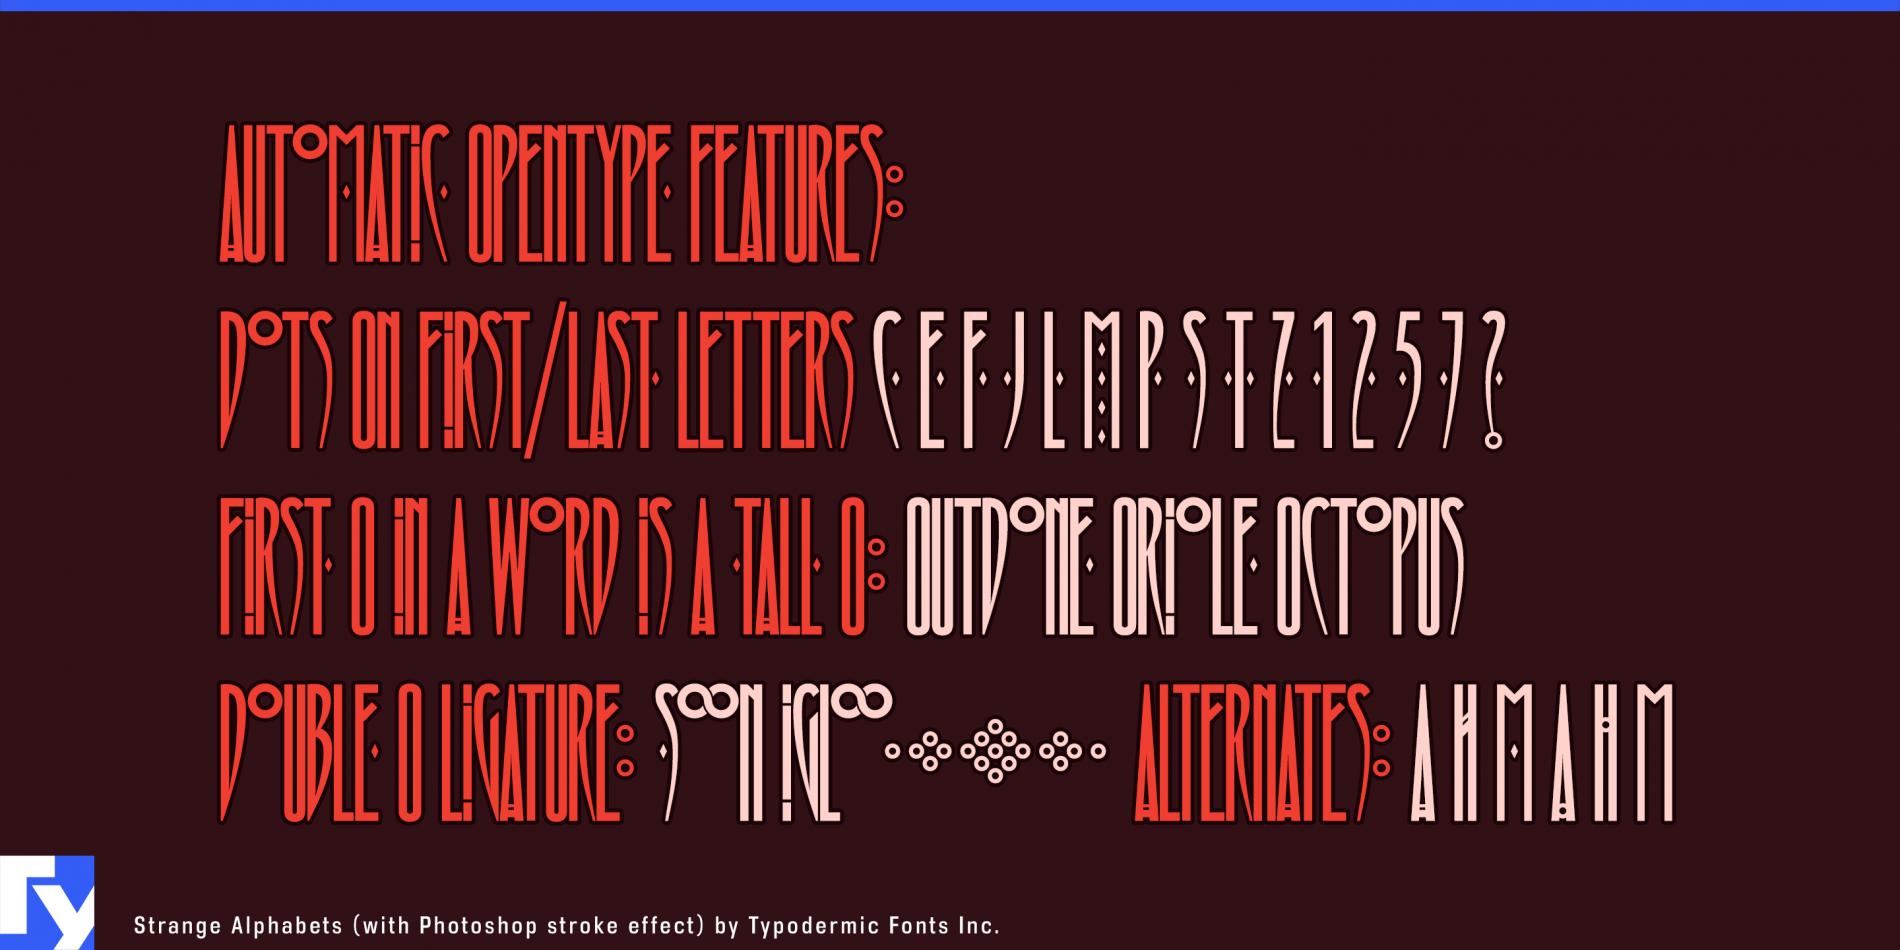 Strange Alphabets